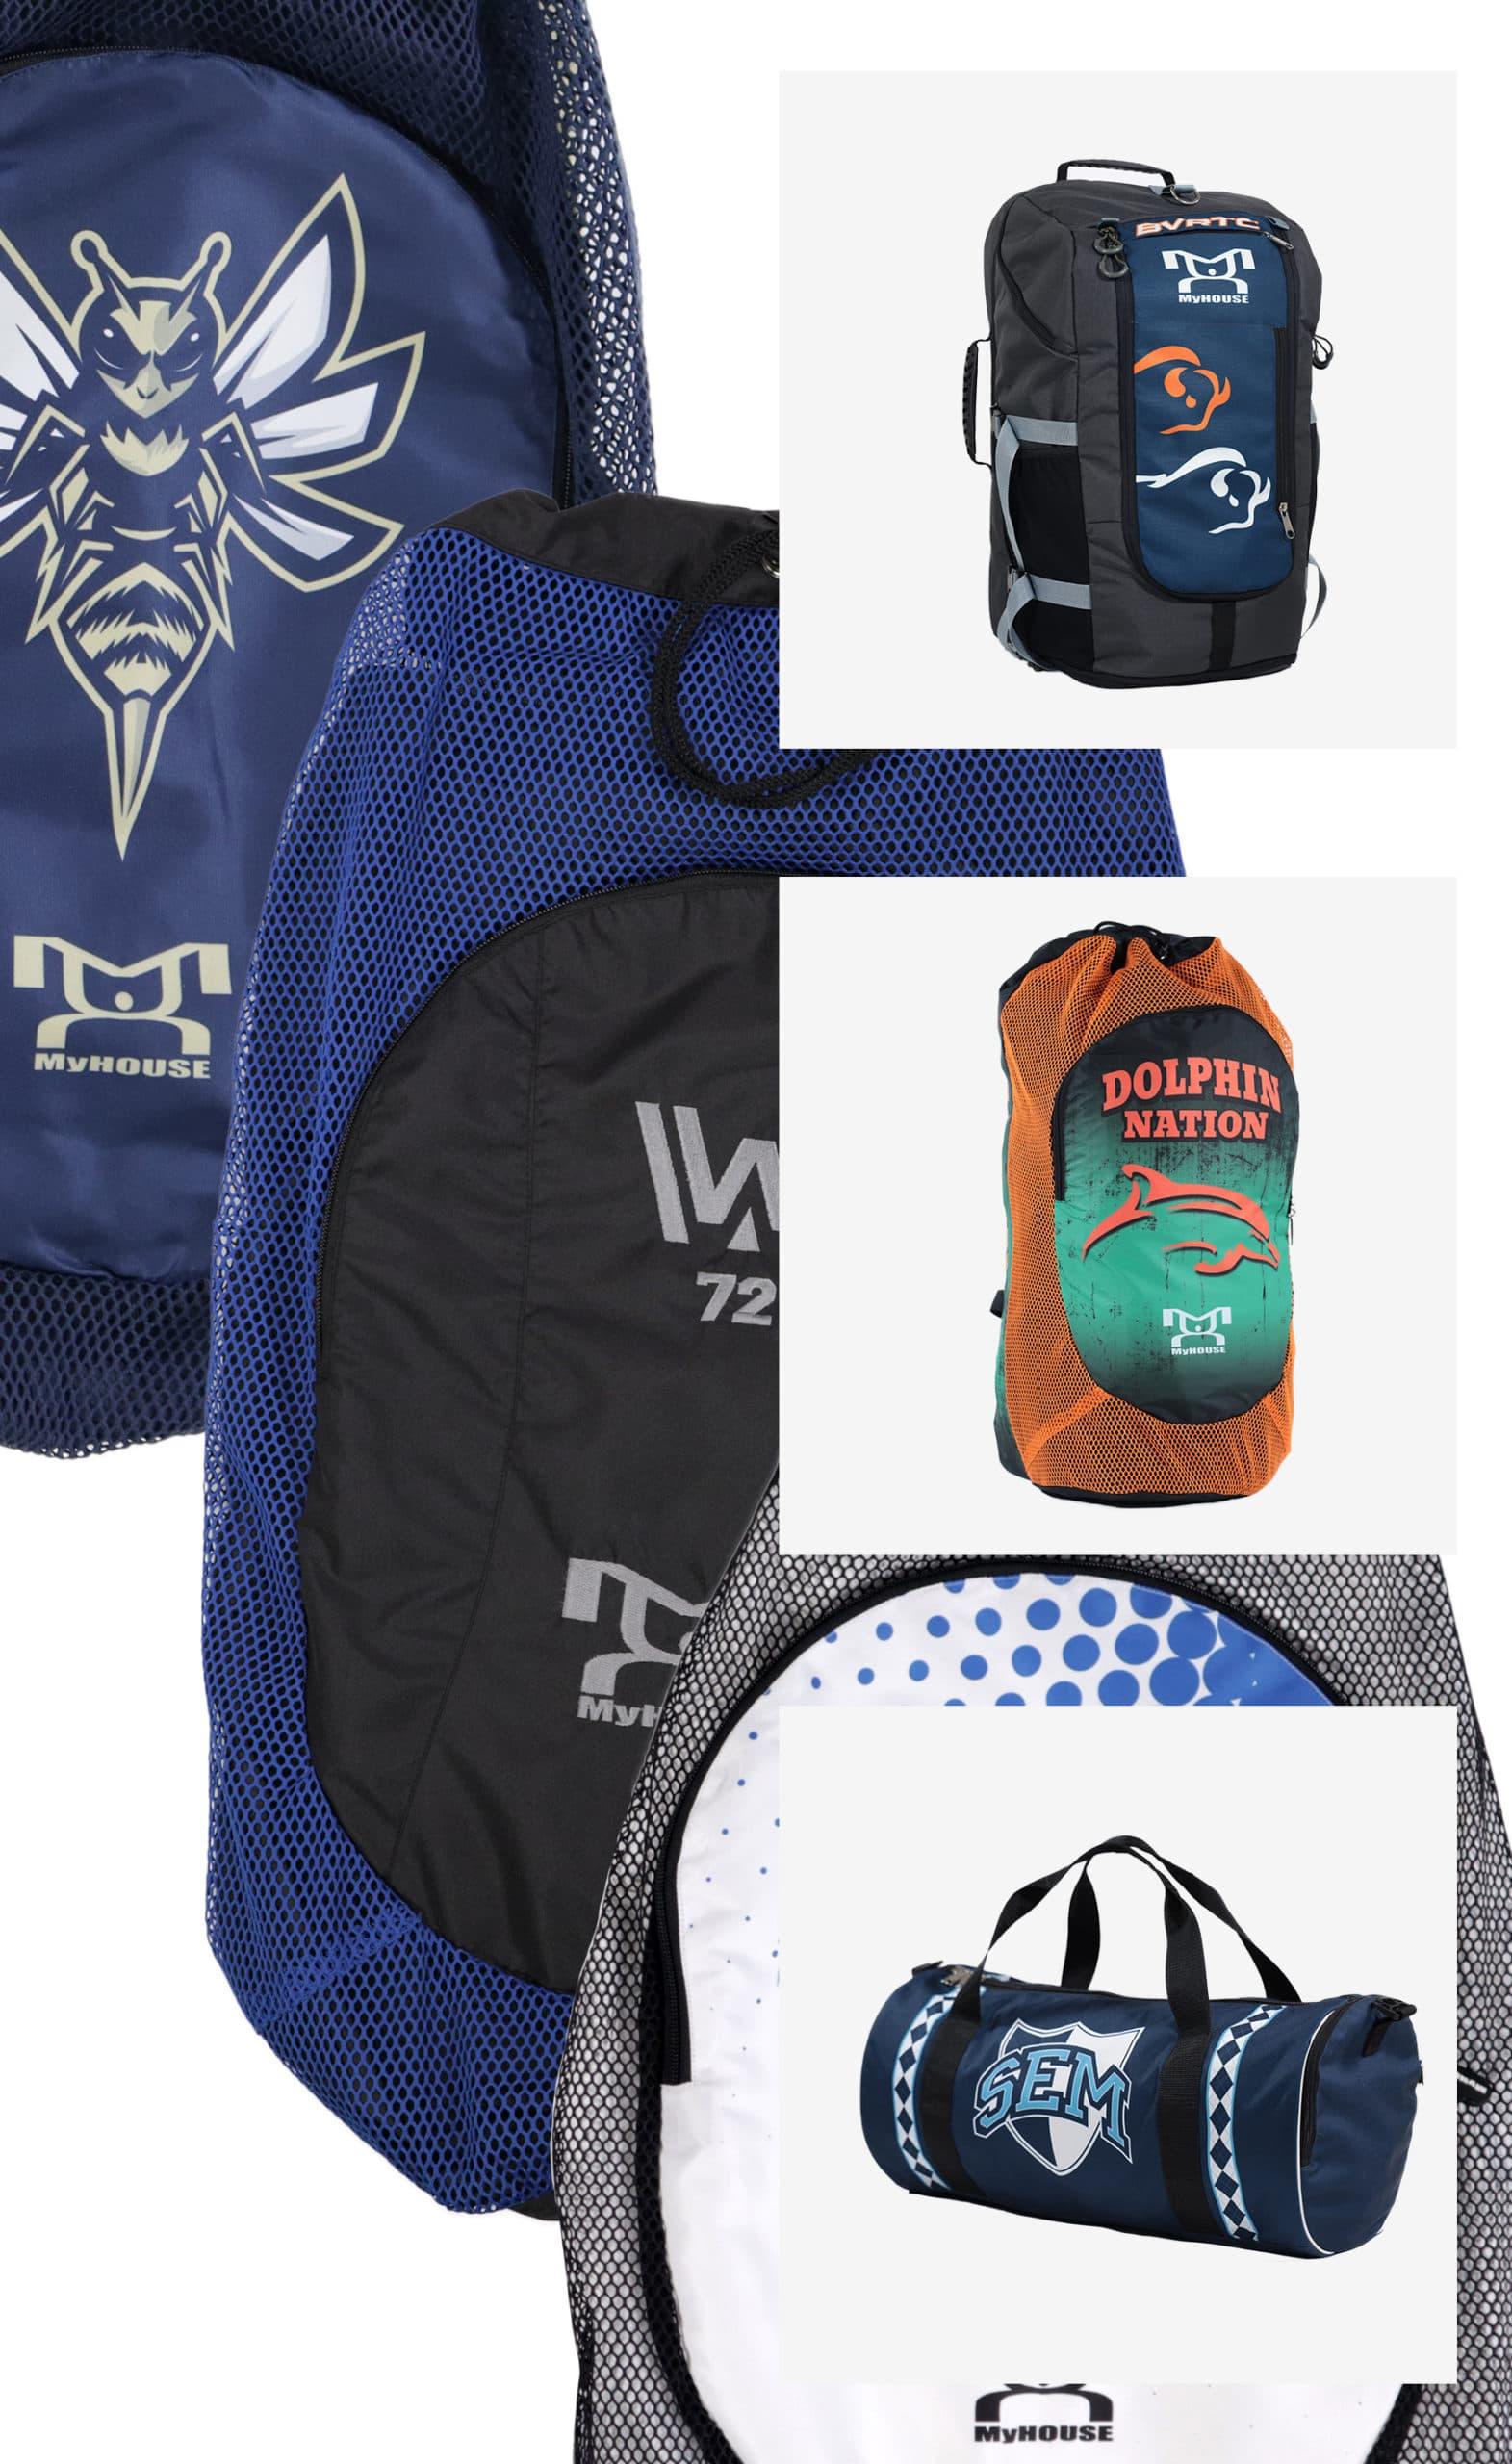 MyHOUSE Sports Gear Gear Bags